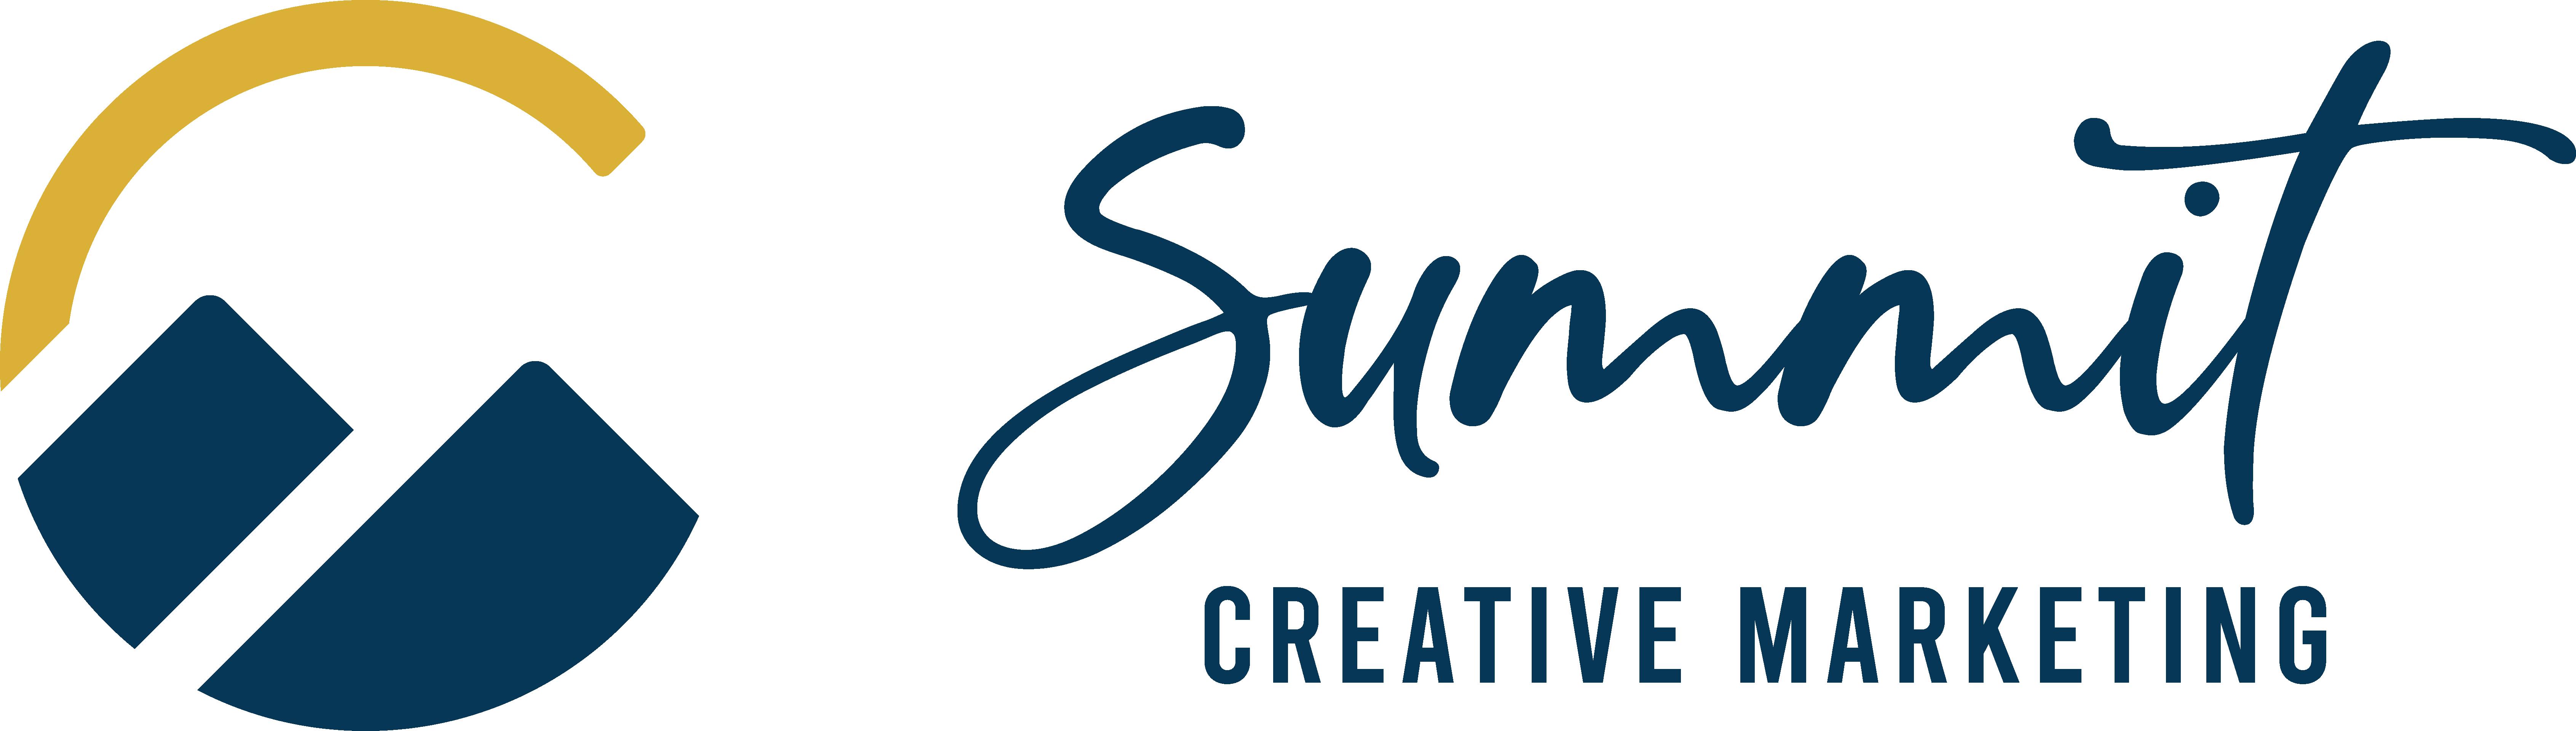 summit creative marketing logo